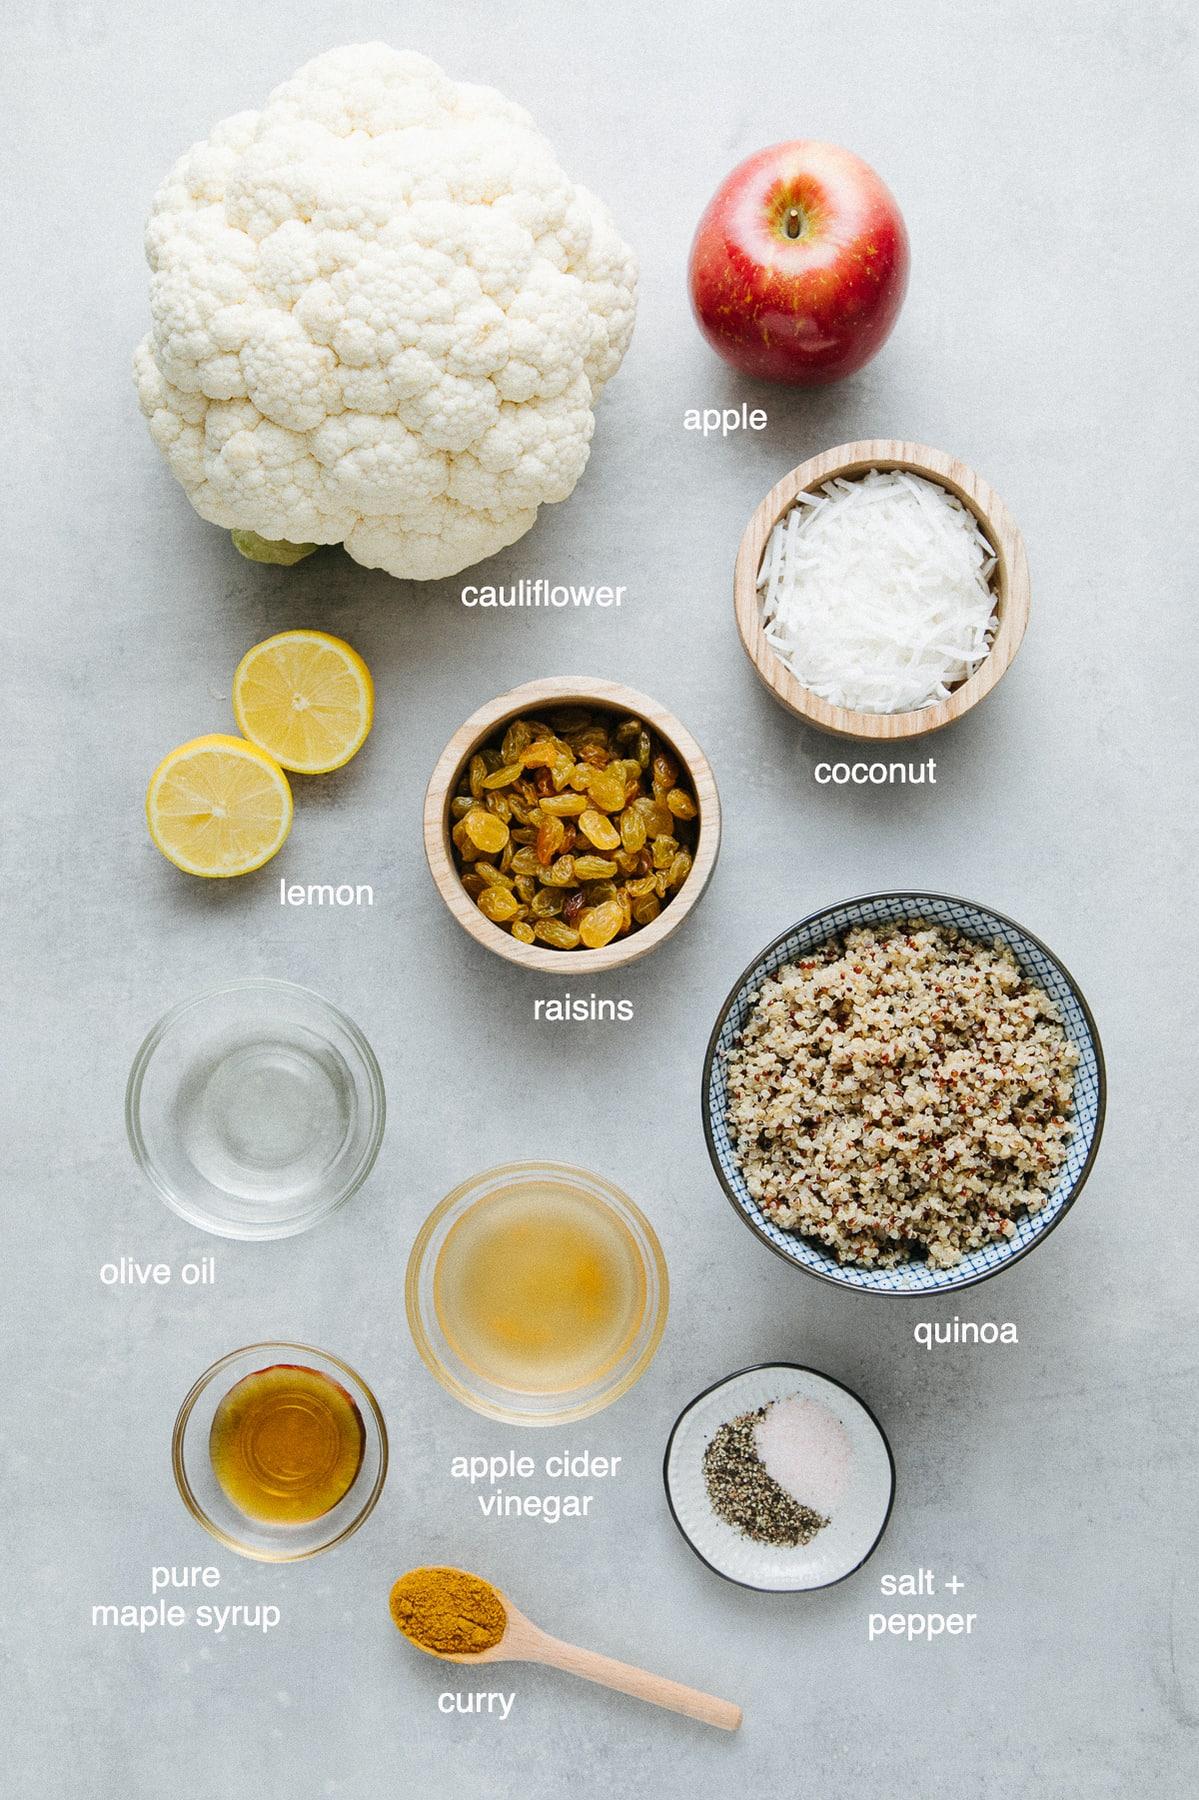 top down view of ingredients used to make curried cauliflower salad.